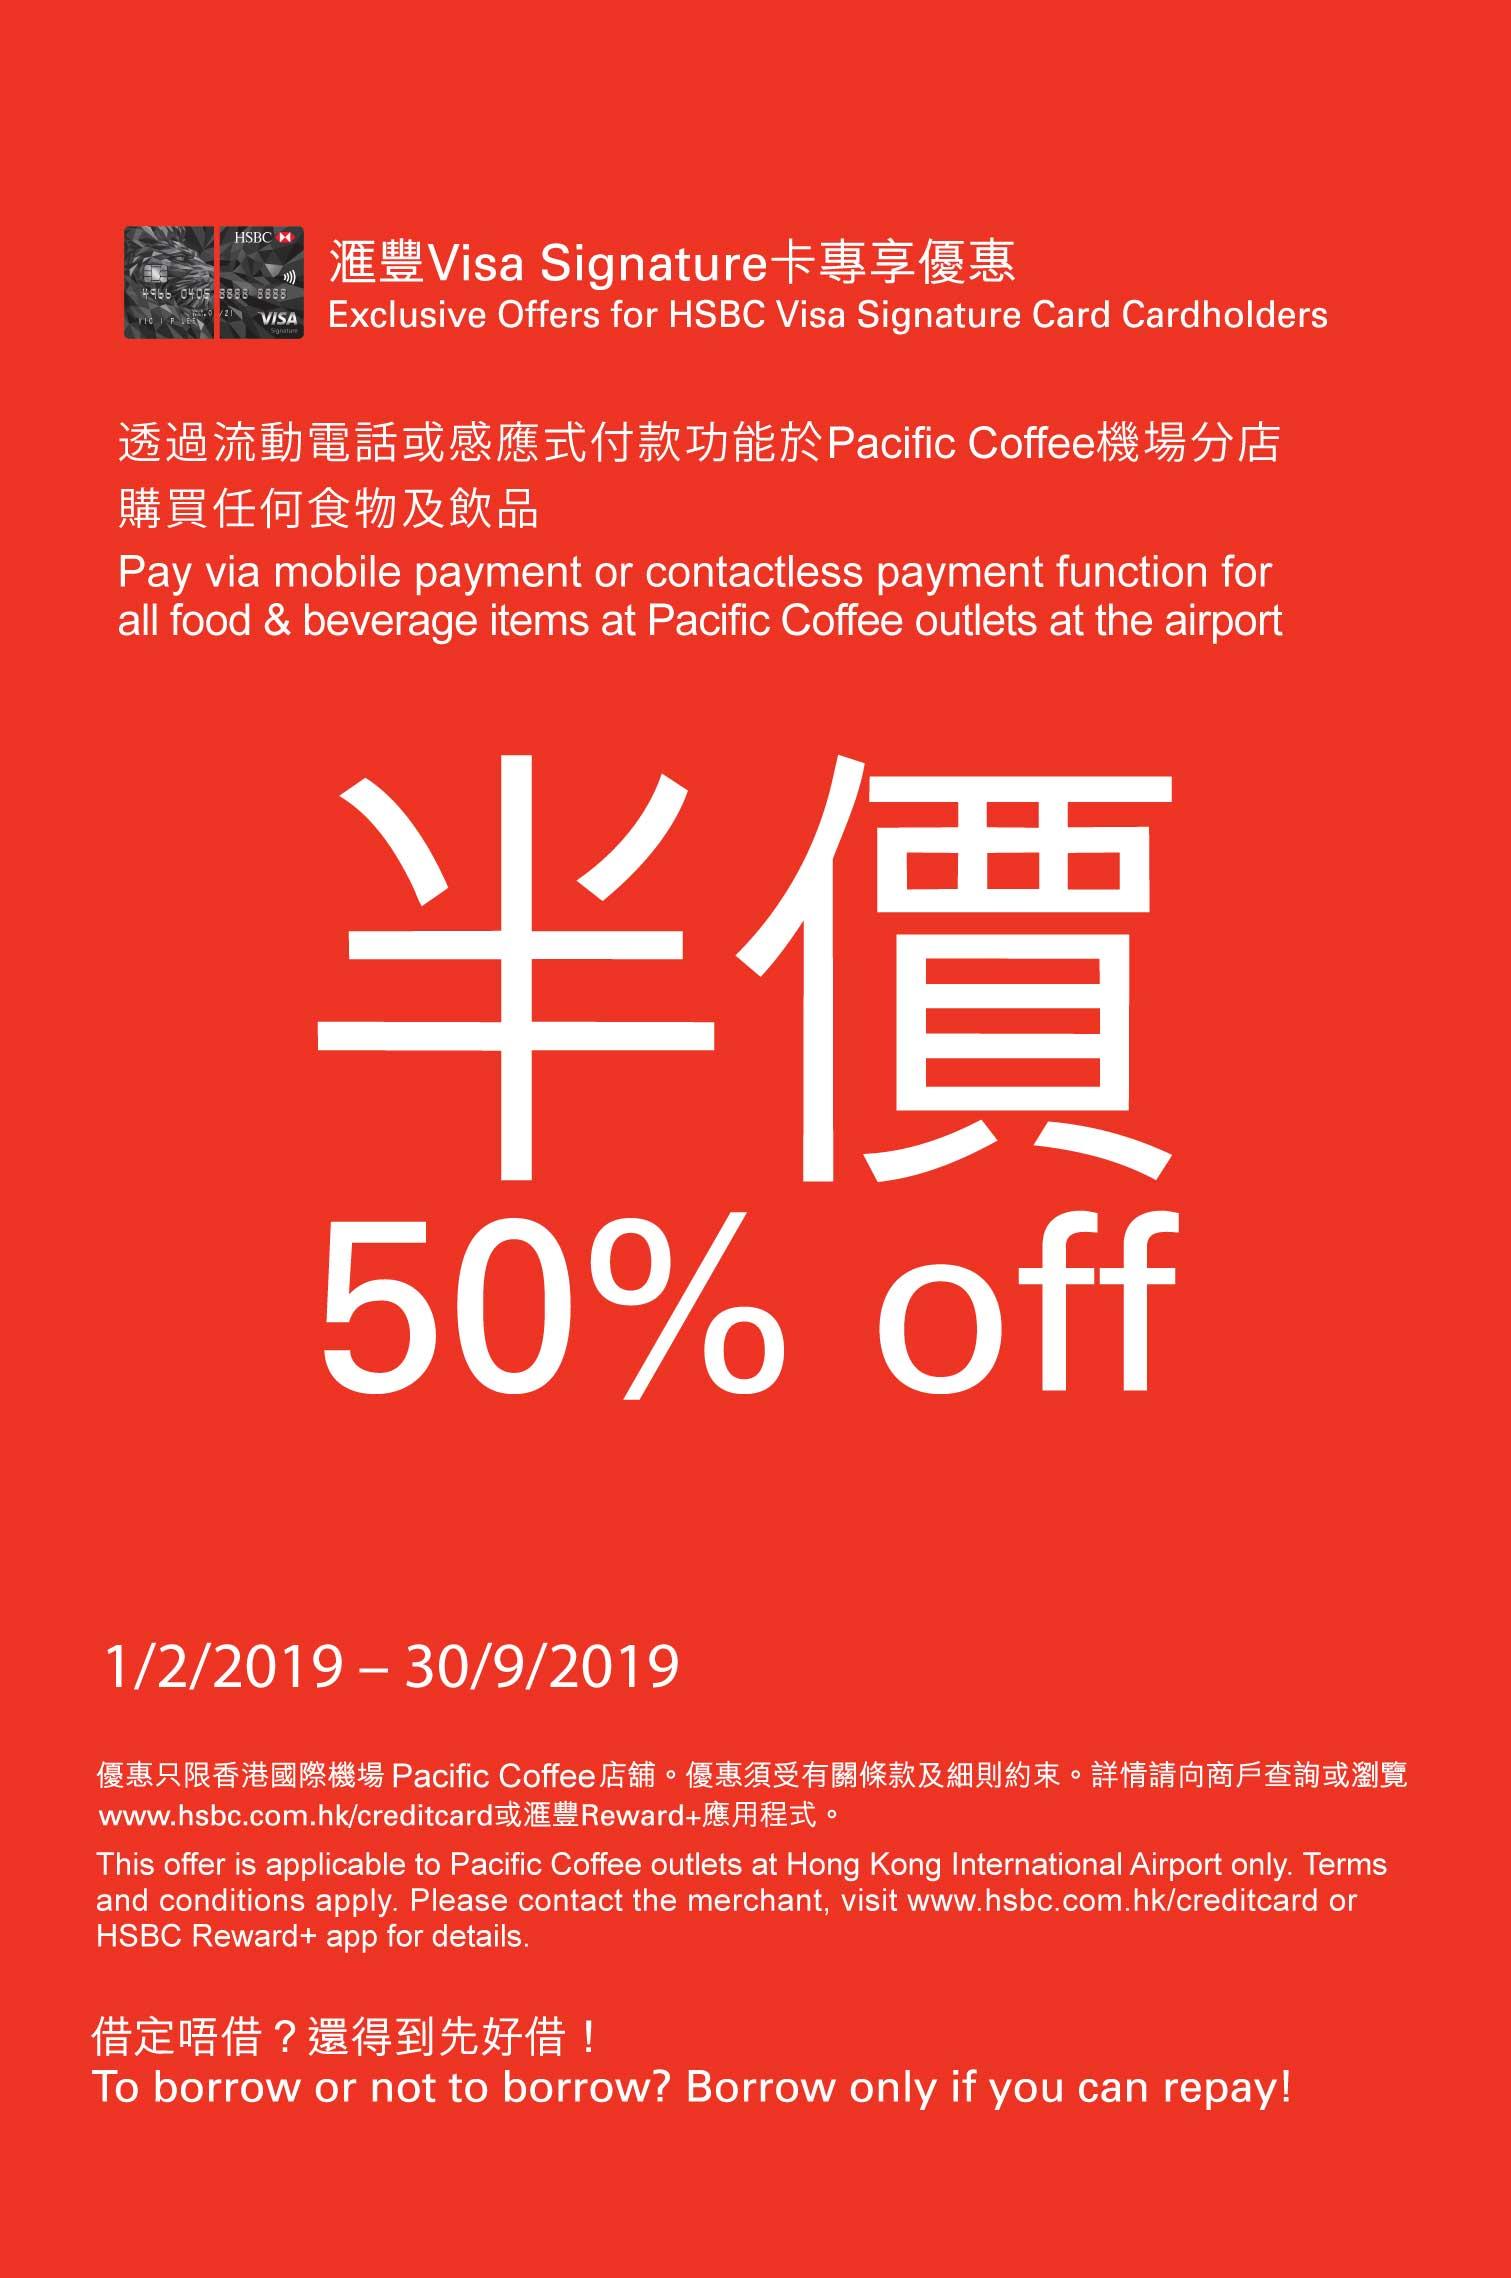 HSBC x Visa promotion - Pacific Coffee